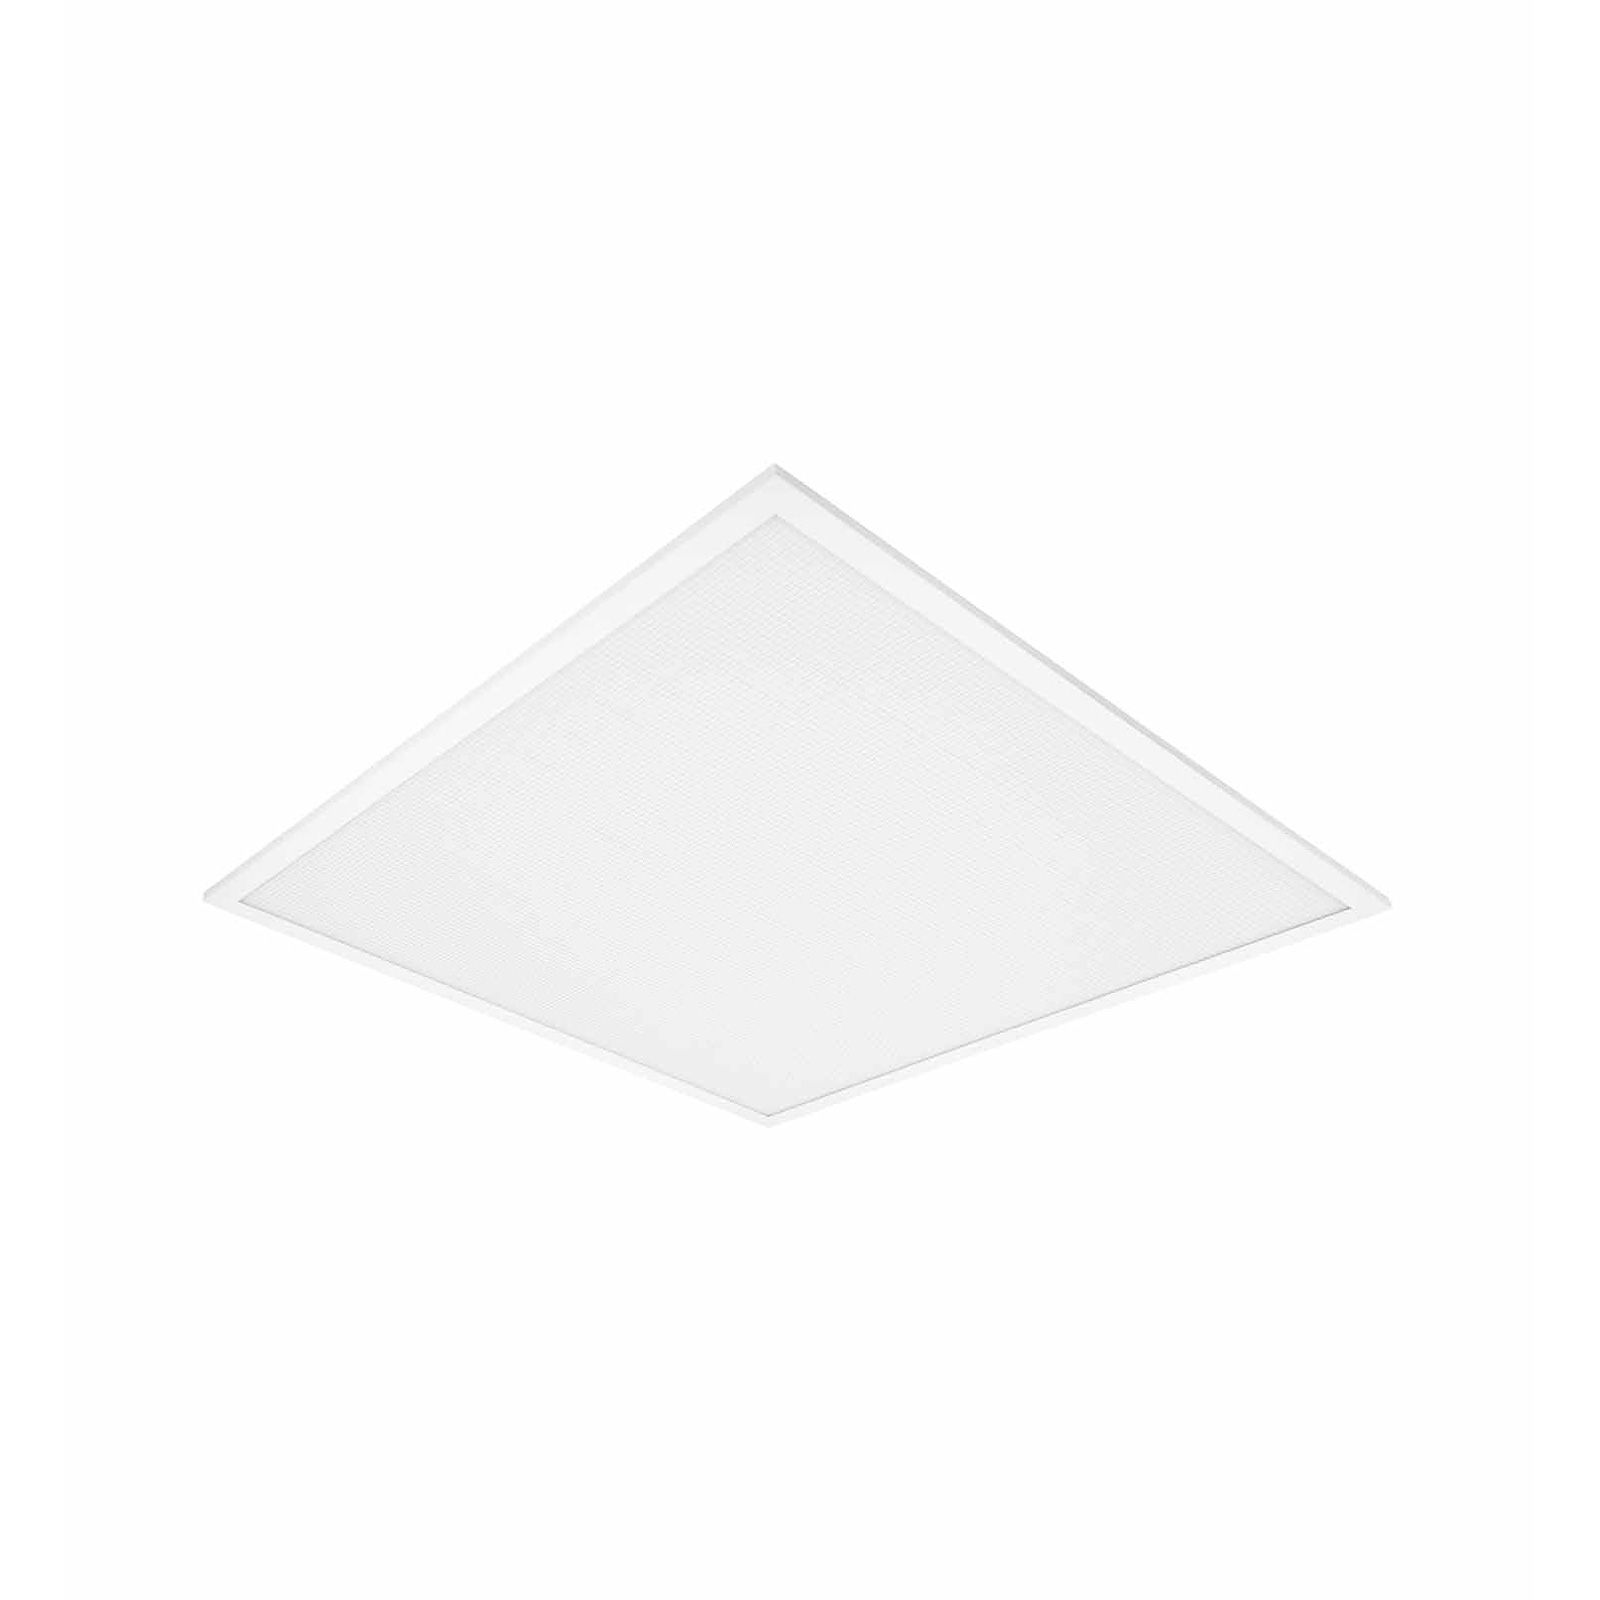 Full Size of Osram Planon Pure Led Panel Light Frameless 600x600mm 600x600 Ledvance 40w 600 X Surface Mount Kit (1200 300mm) Lightify 32w Table Lamp 60x60 1200x300mm 60w Wohnzimmer Osram Led Panel